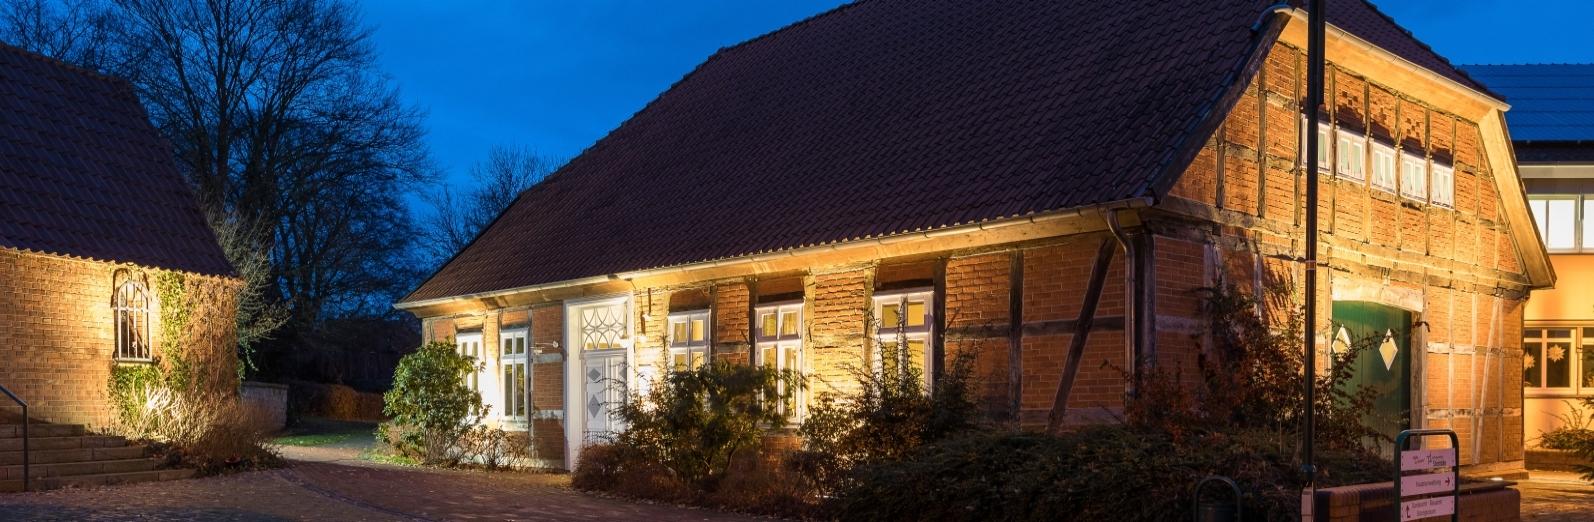 Startseite Banner 04 (Illumination Küsterhaus)